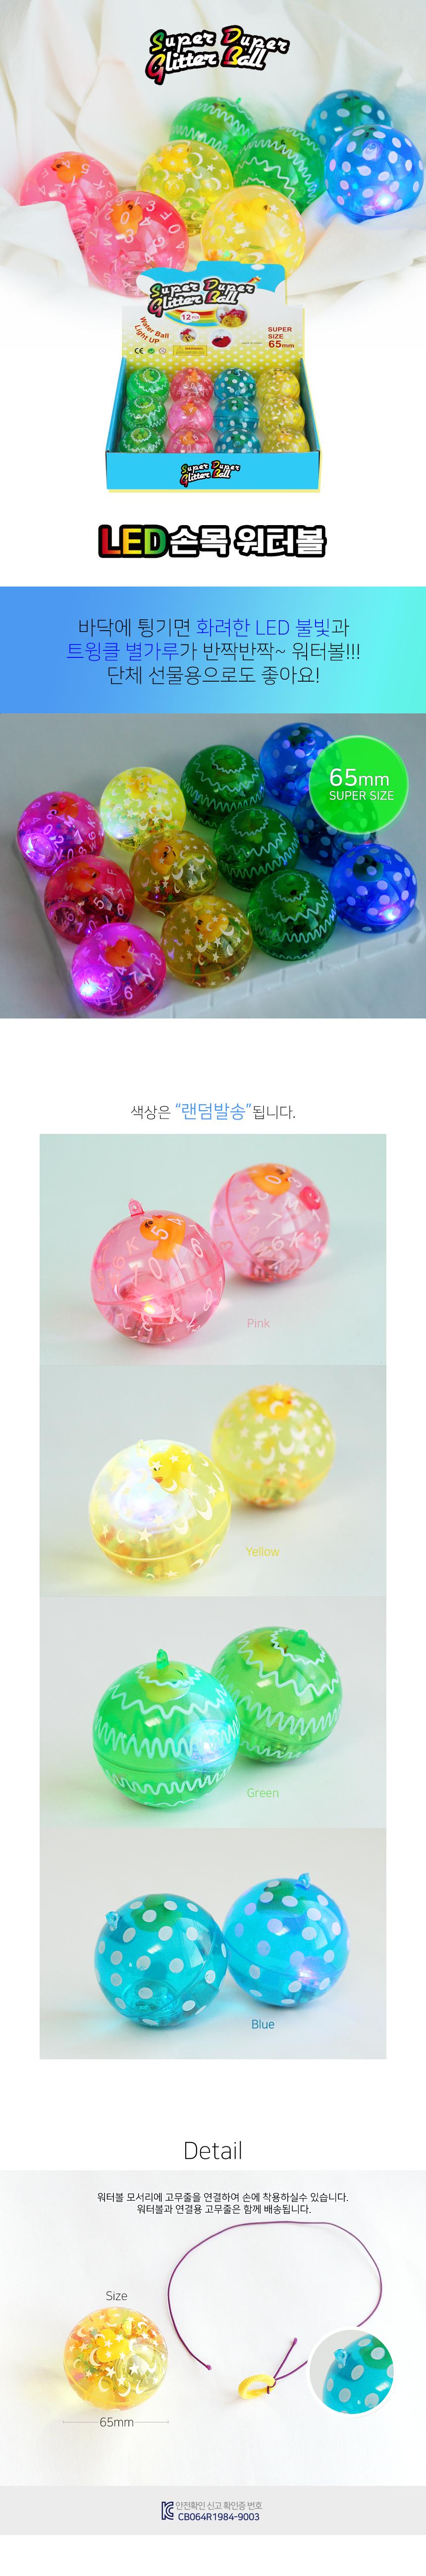 led_waterball.jpg